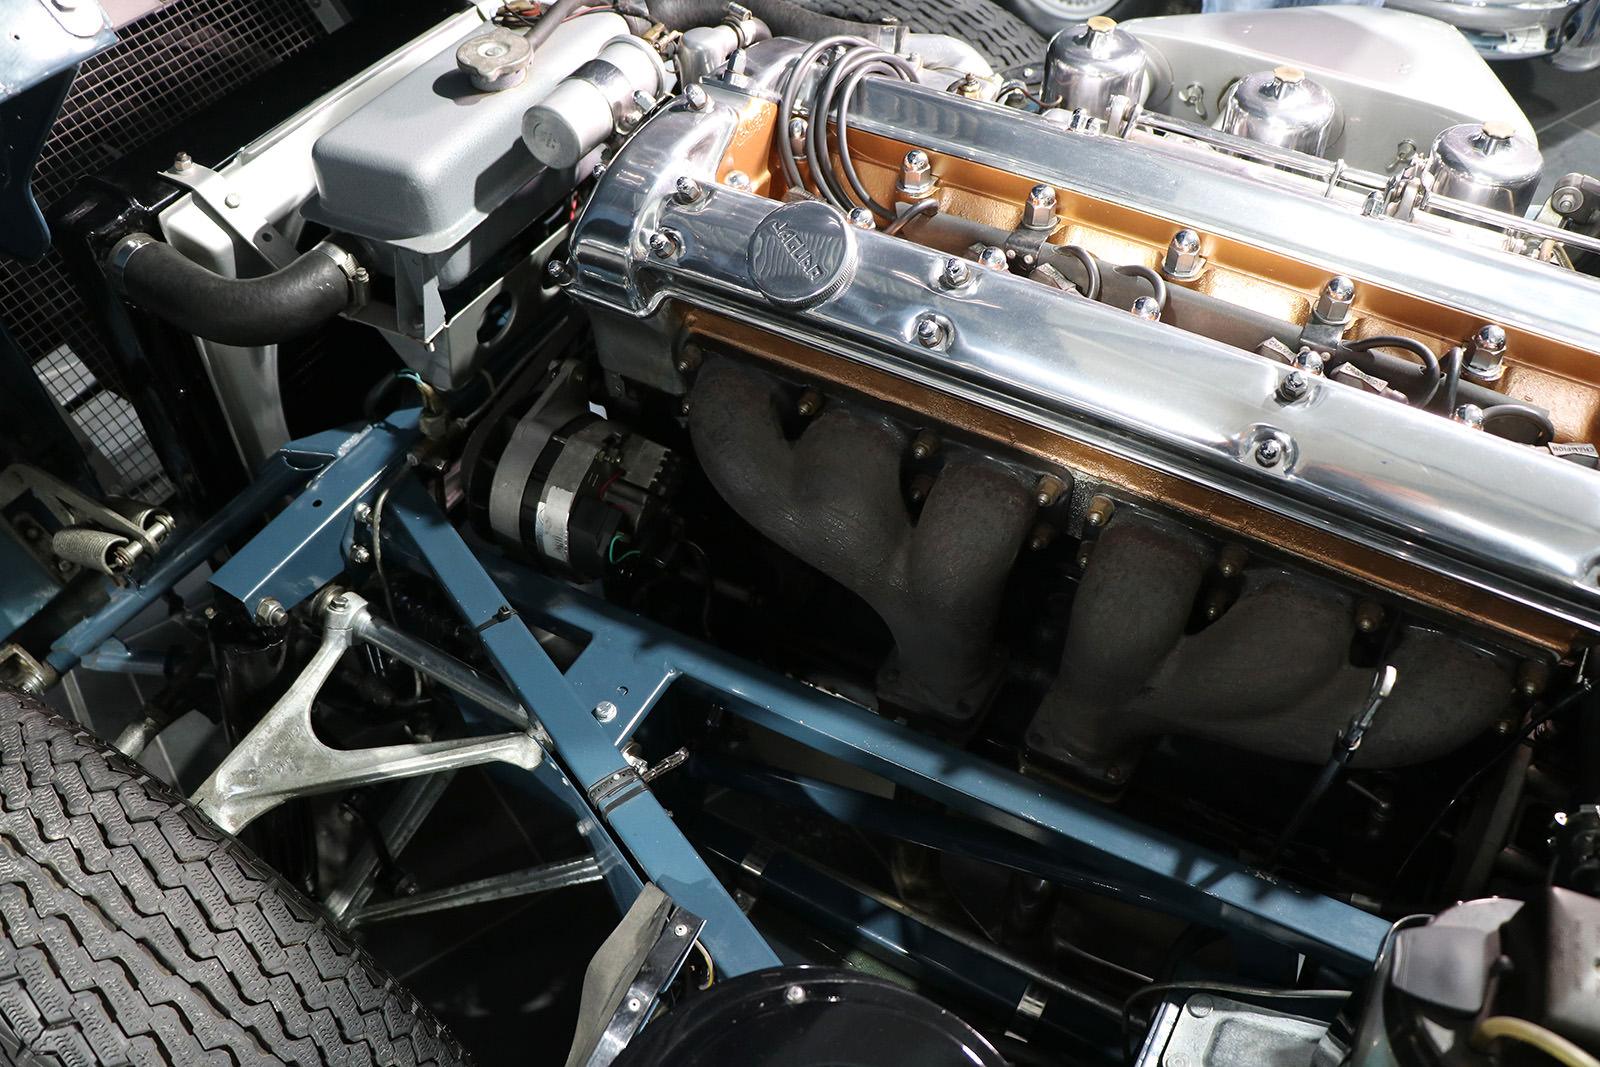 1963_cotswold_blue_series 1_jaguar_etype_sayer_selection_wilkinson_web_32.jpg